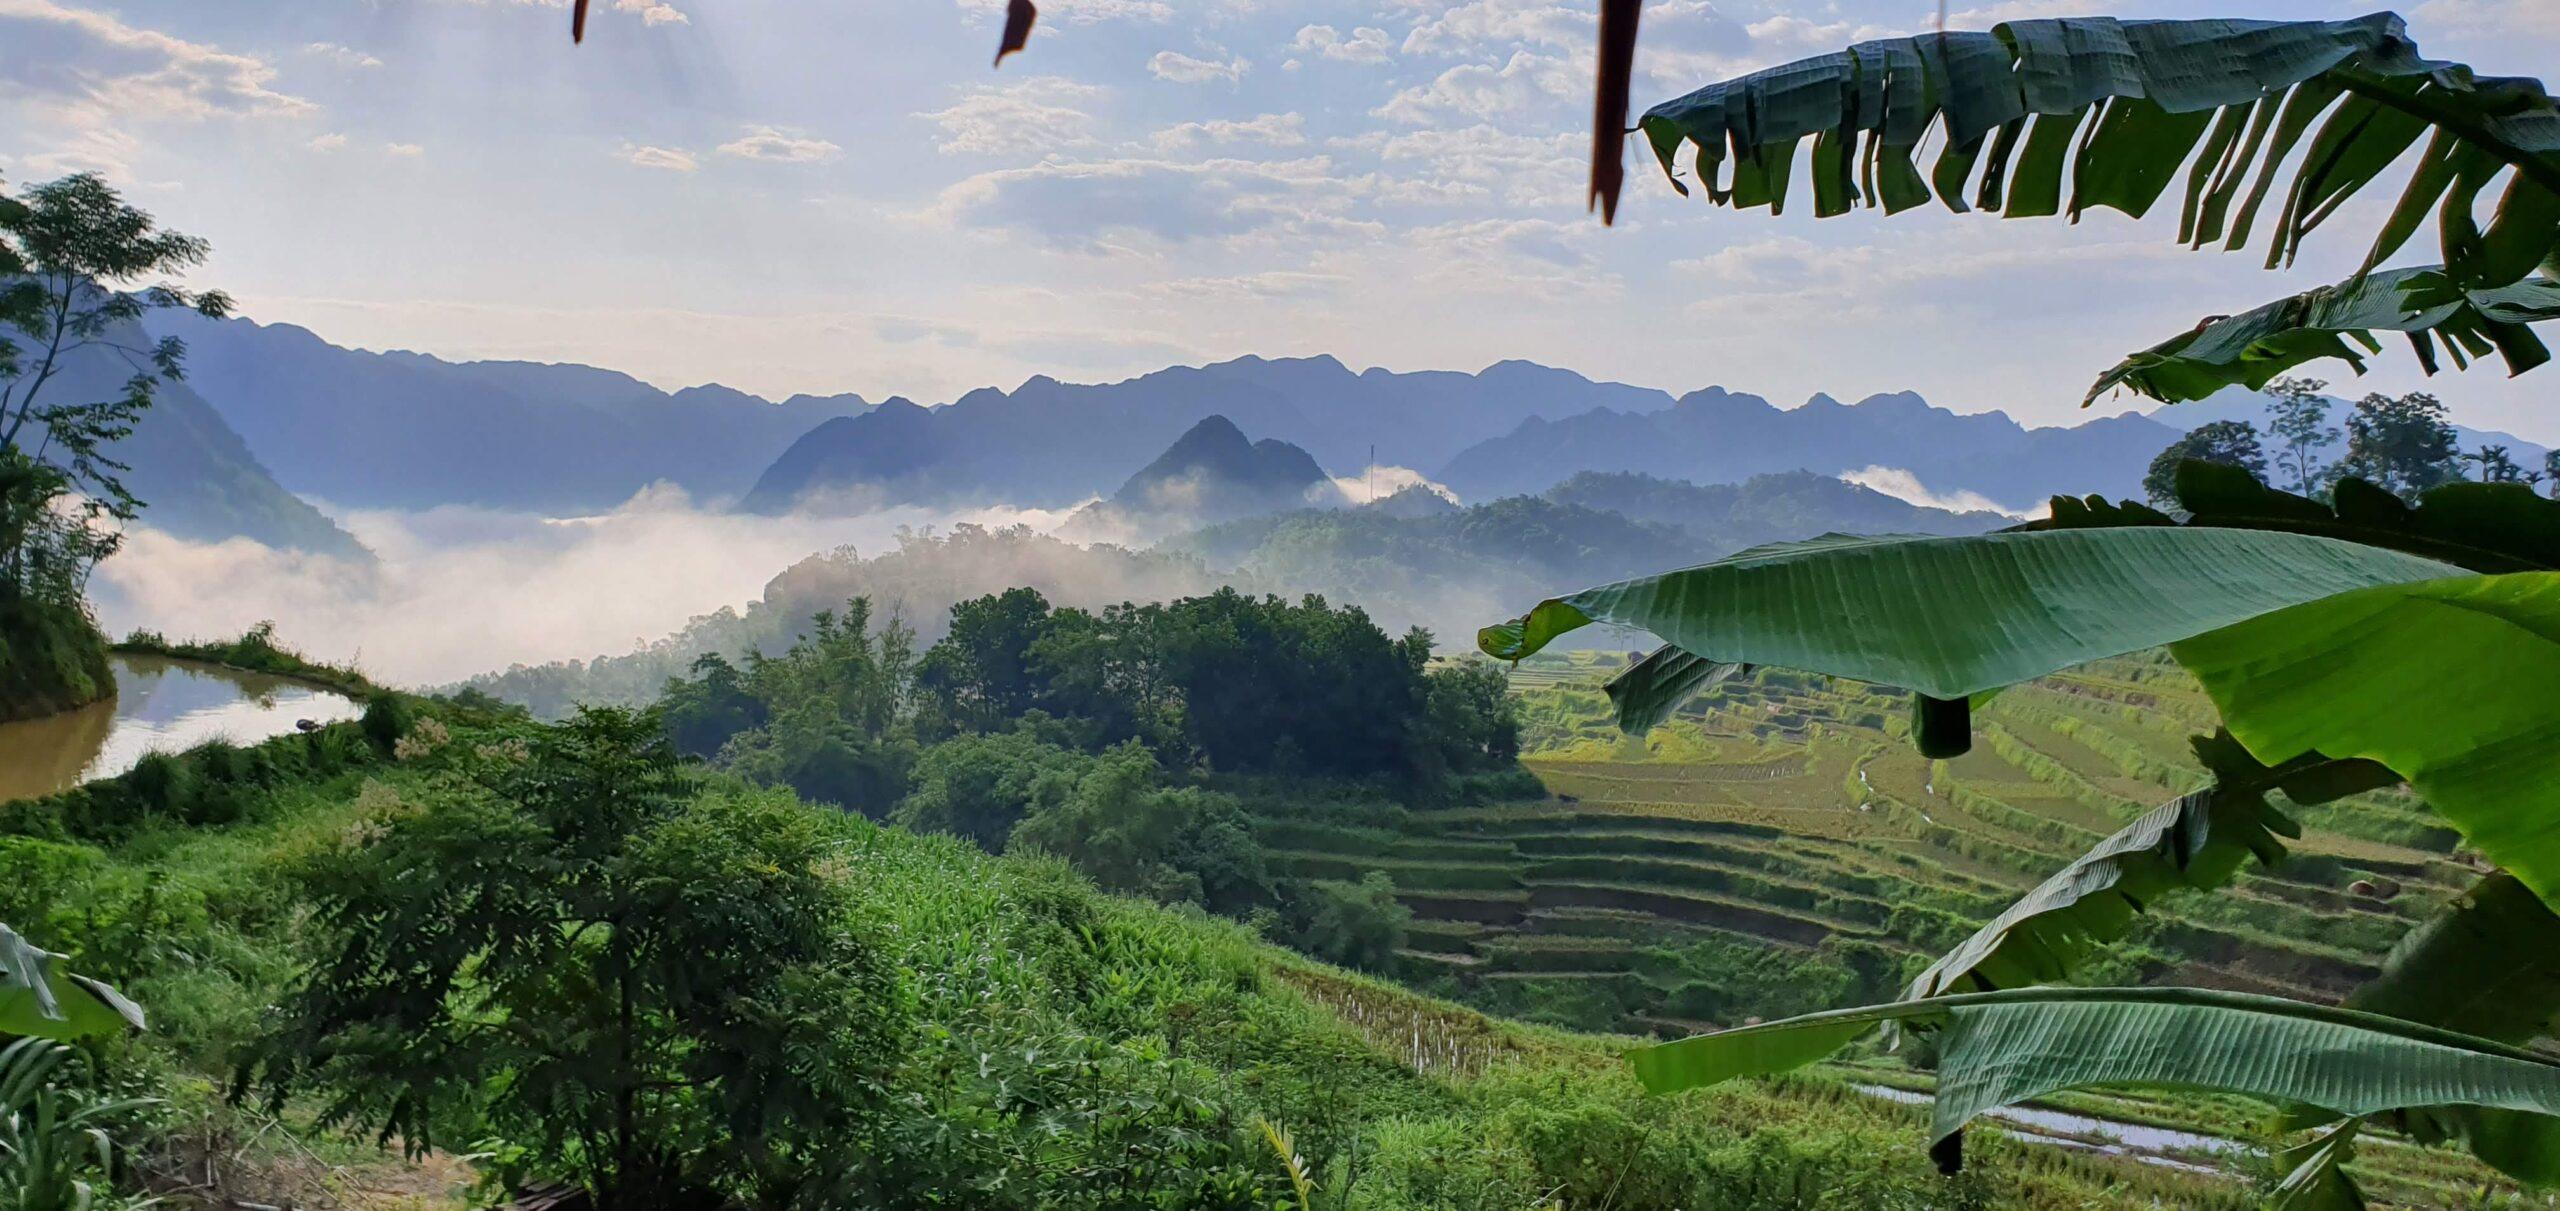 Stunning Pu Luong